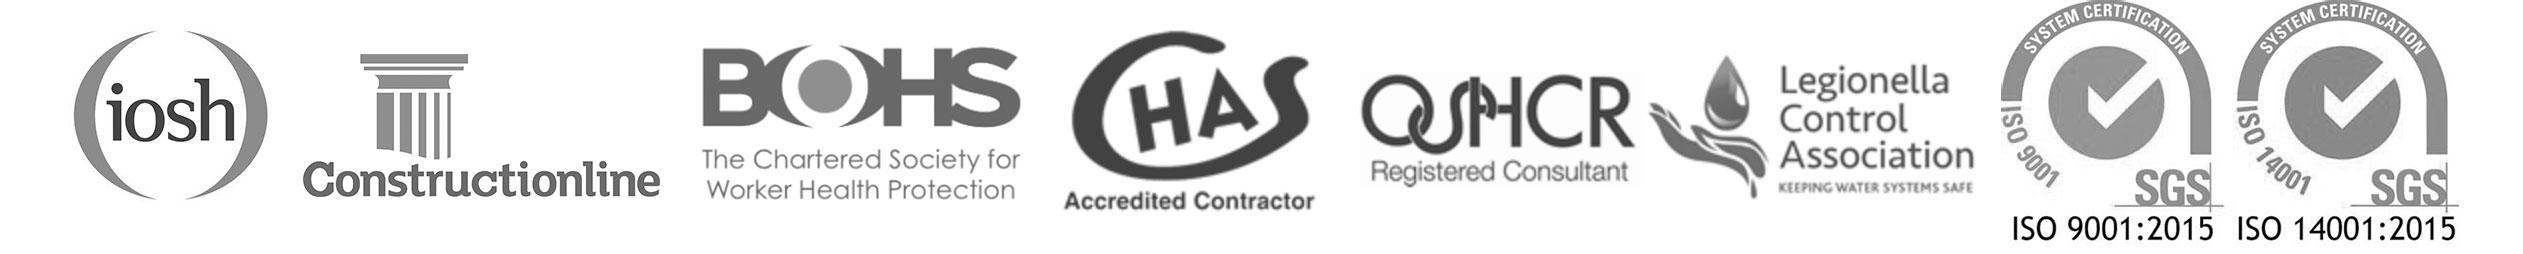 coral-homepage-logos2